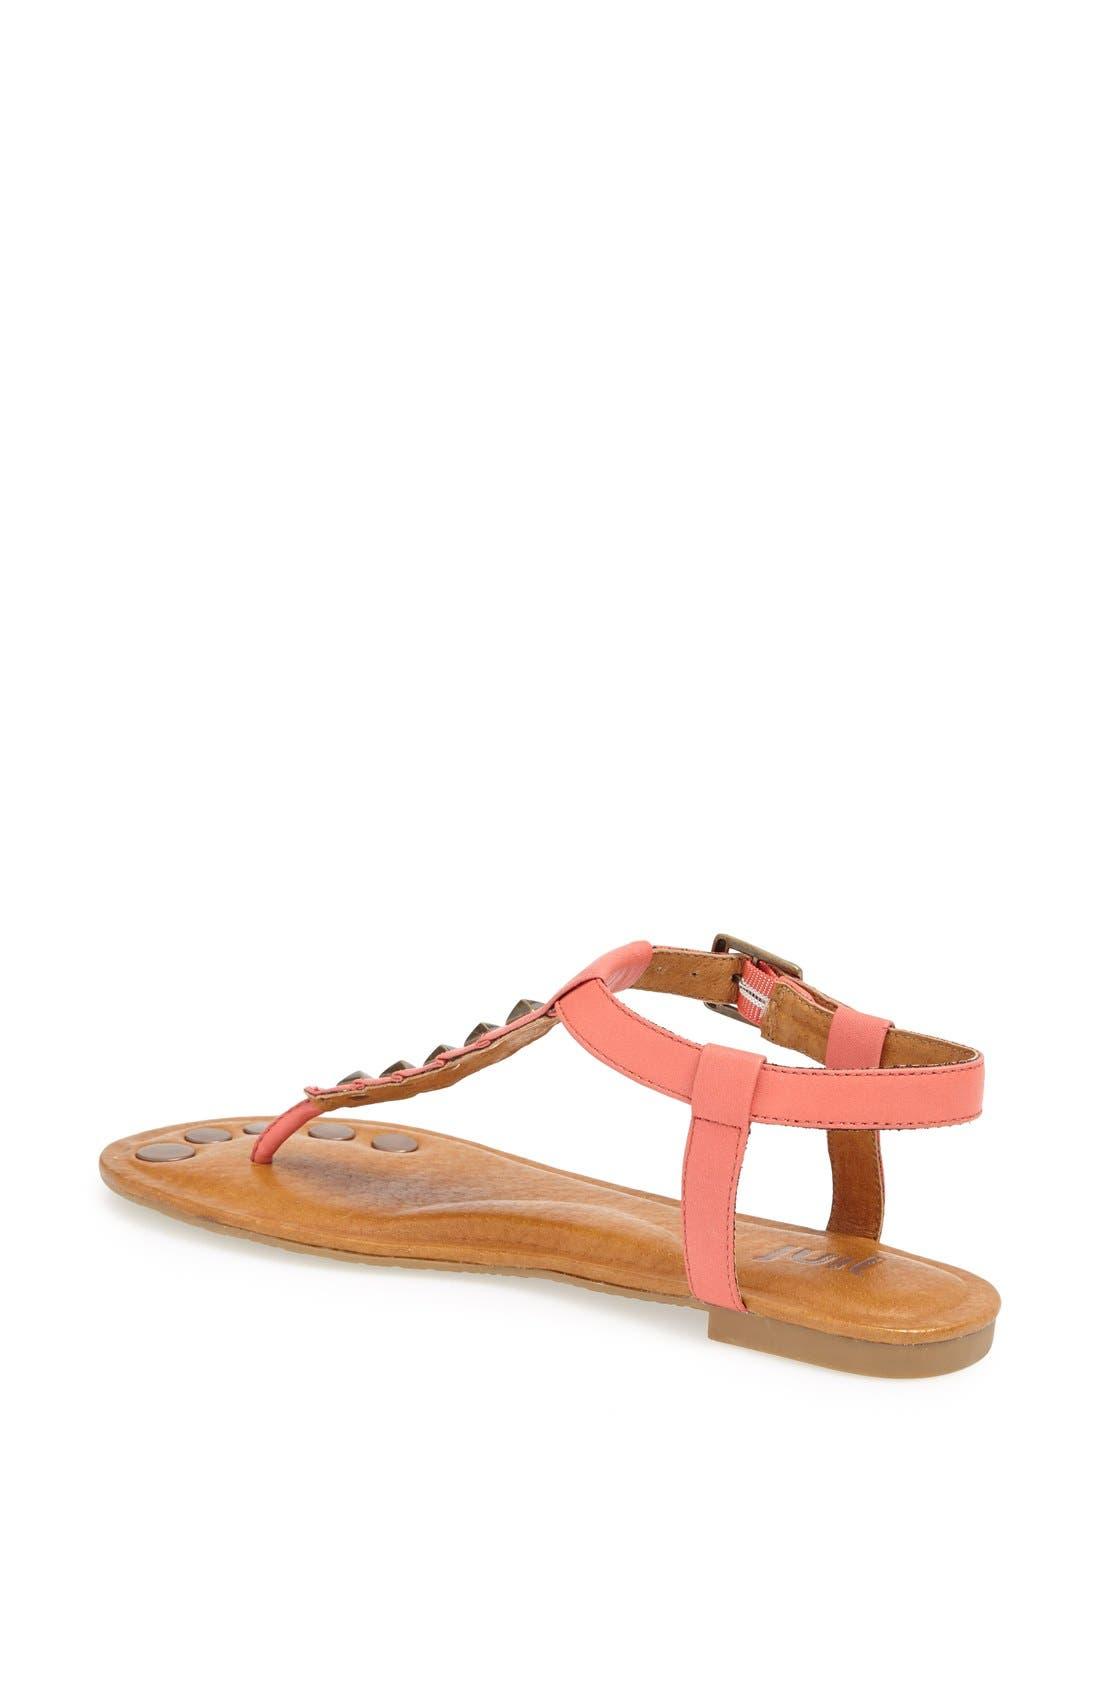 Alternate Image 2  - Juil 'Kava' Grounded Leather Sandal